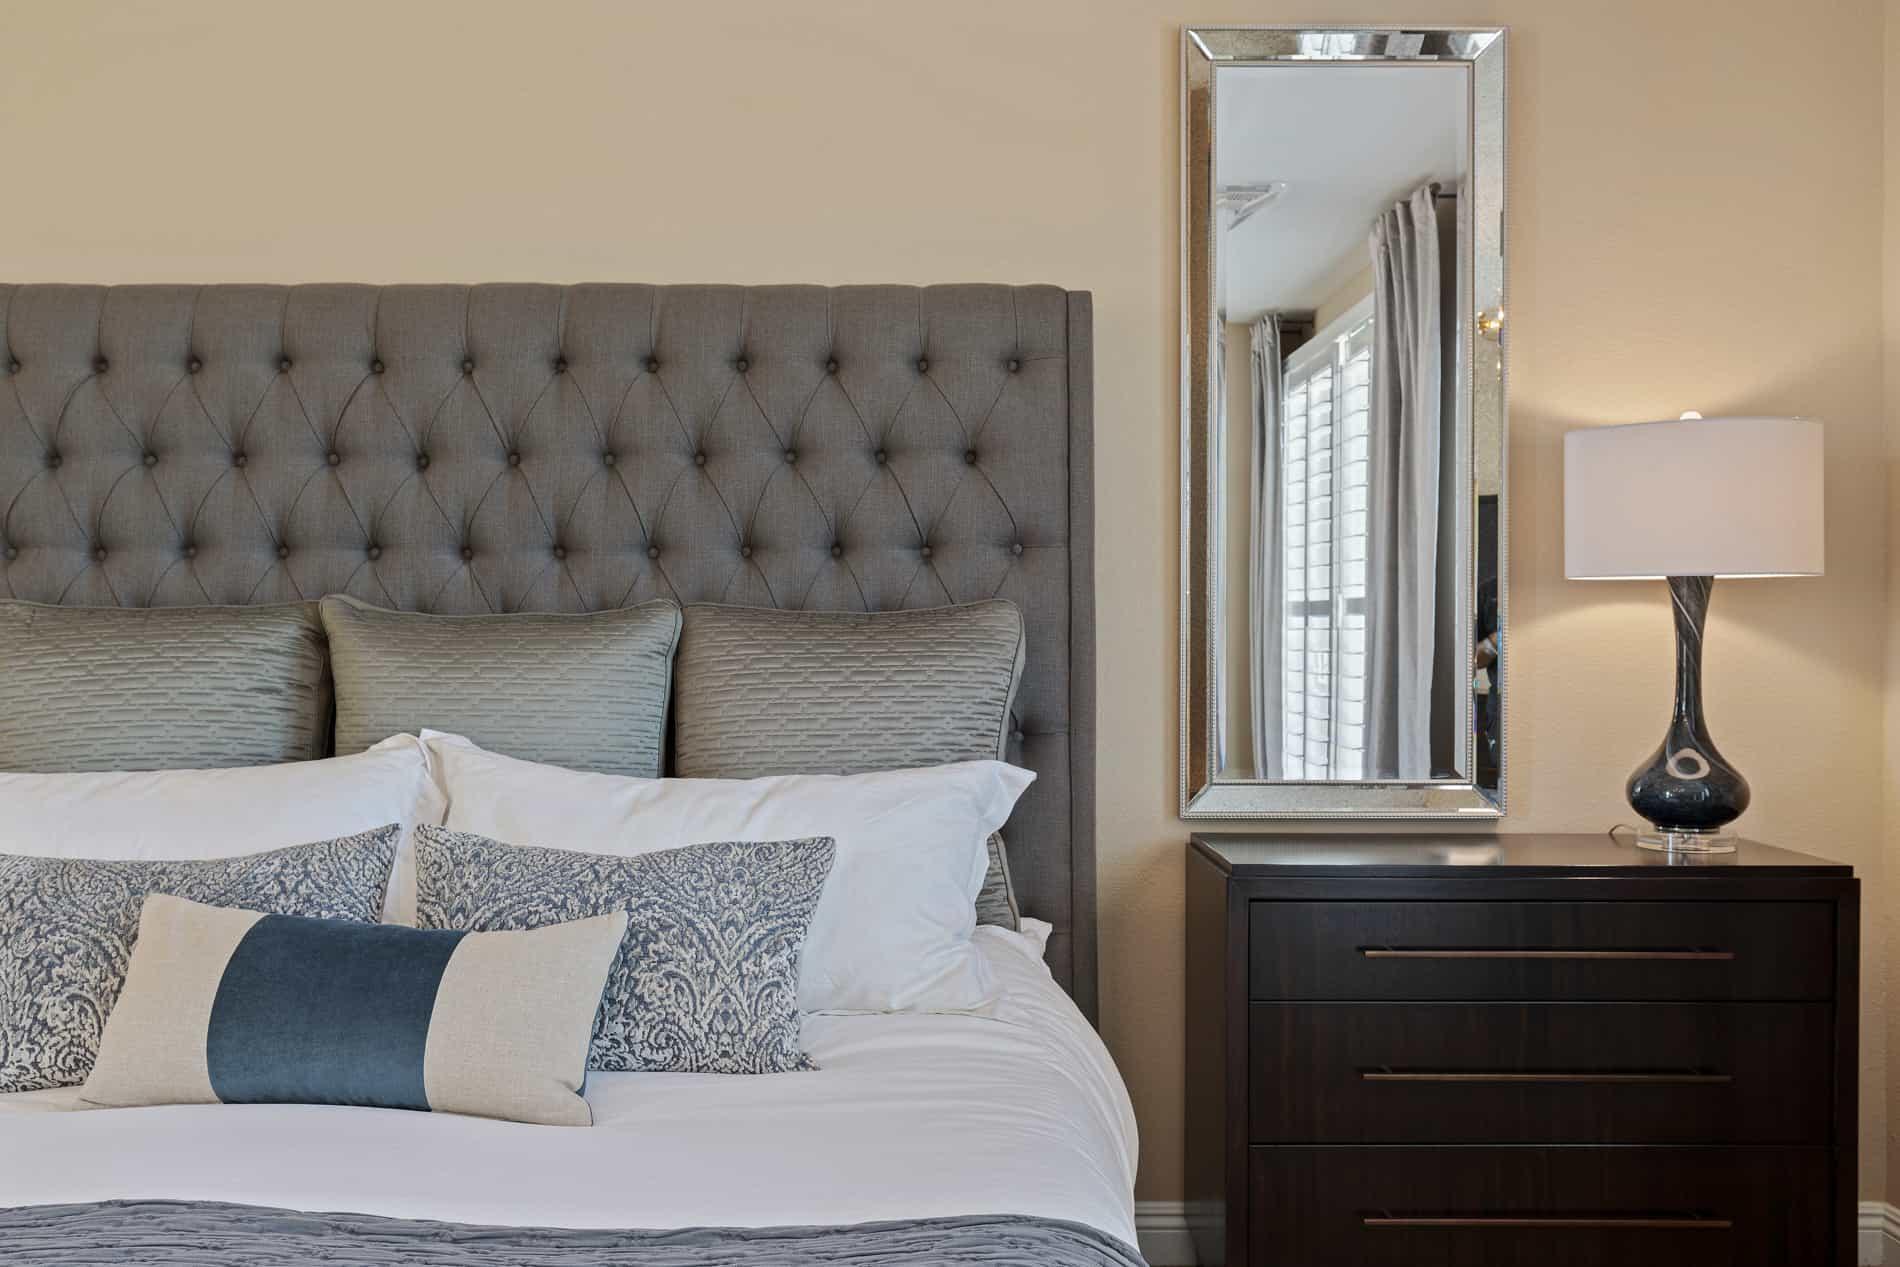 las-vegas-luxry-real-estate-realtor-rob-jensen-company-12108-vista-linda-avenue-the-paseos041